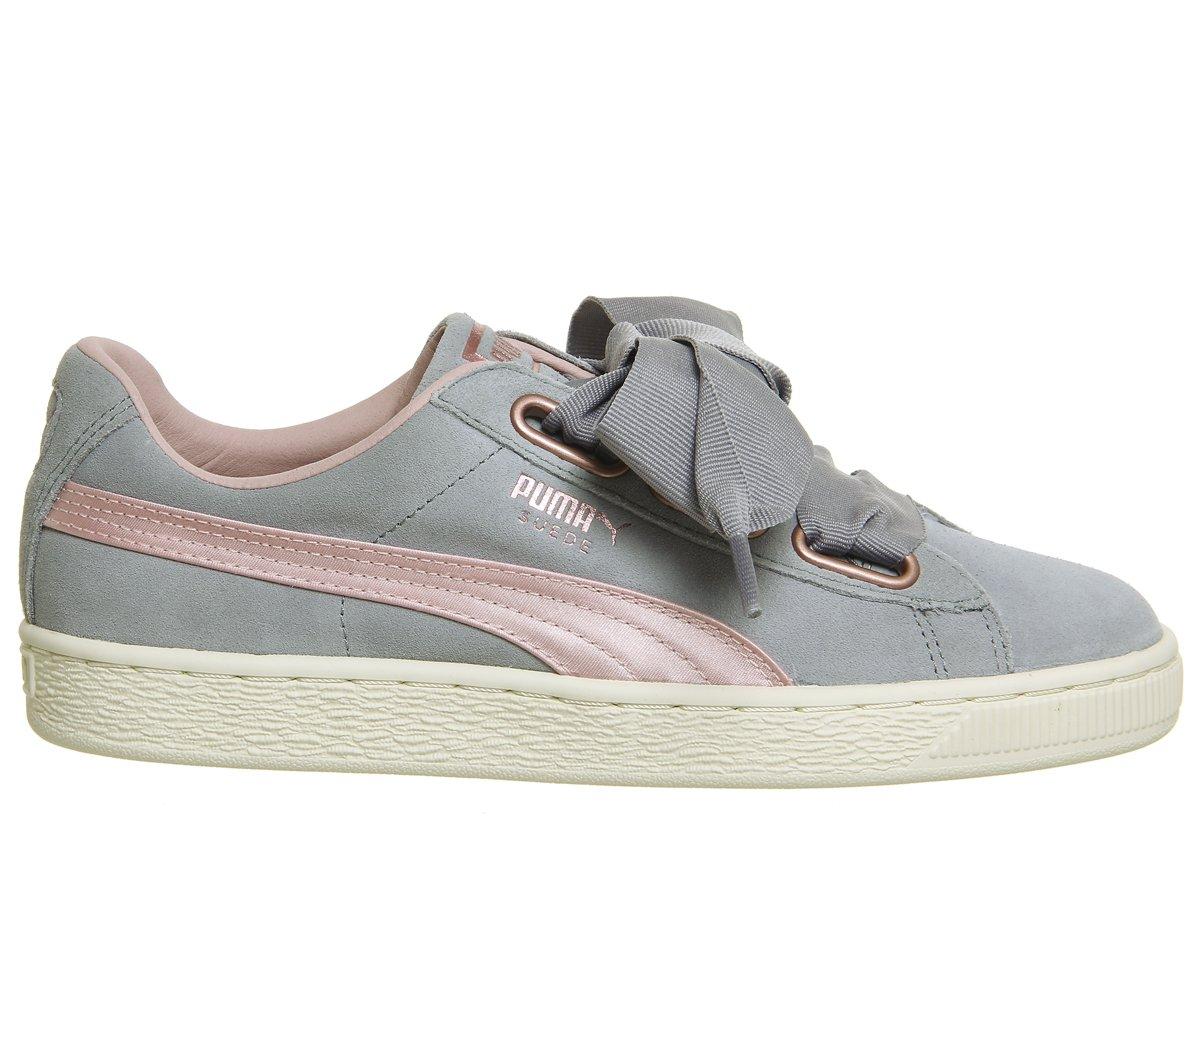 Puma Suede Heart Safari, Zapatillas para Mujer 41 EU Quarry Silver Pink Rose Gold